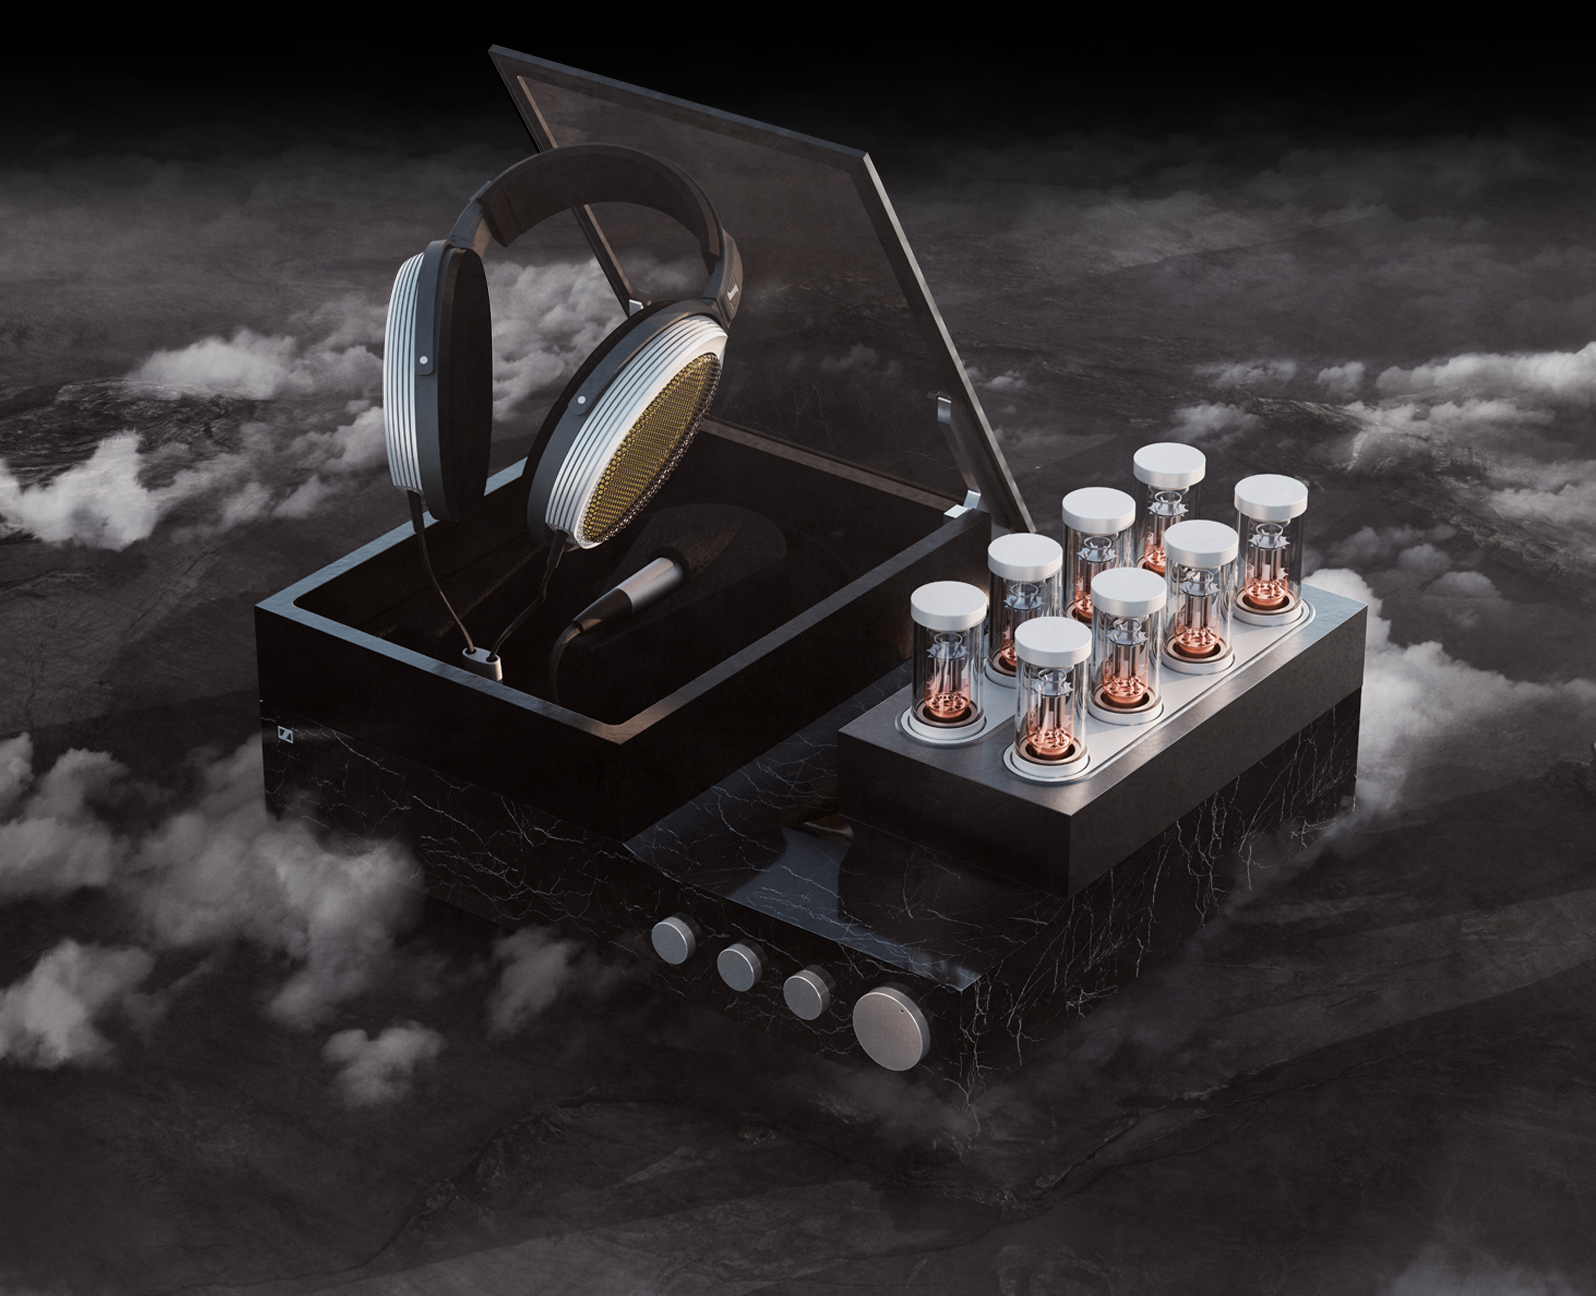 Meet the new Sennheiser headphones with a sports car price tag